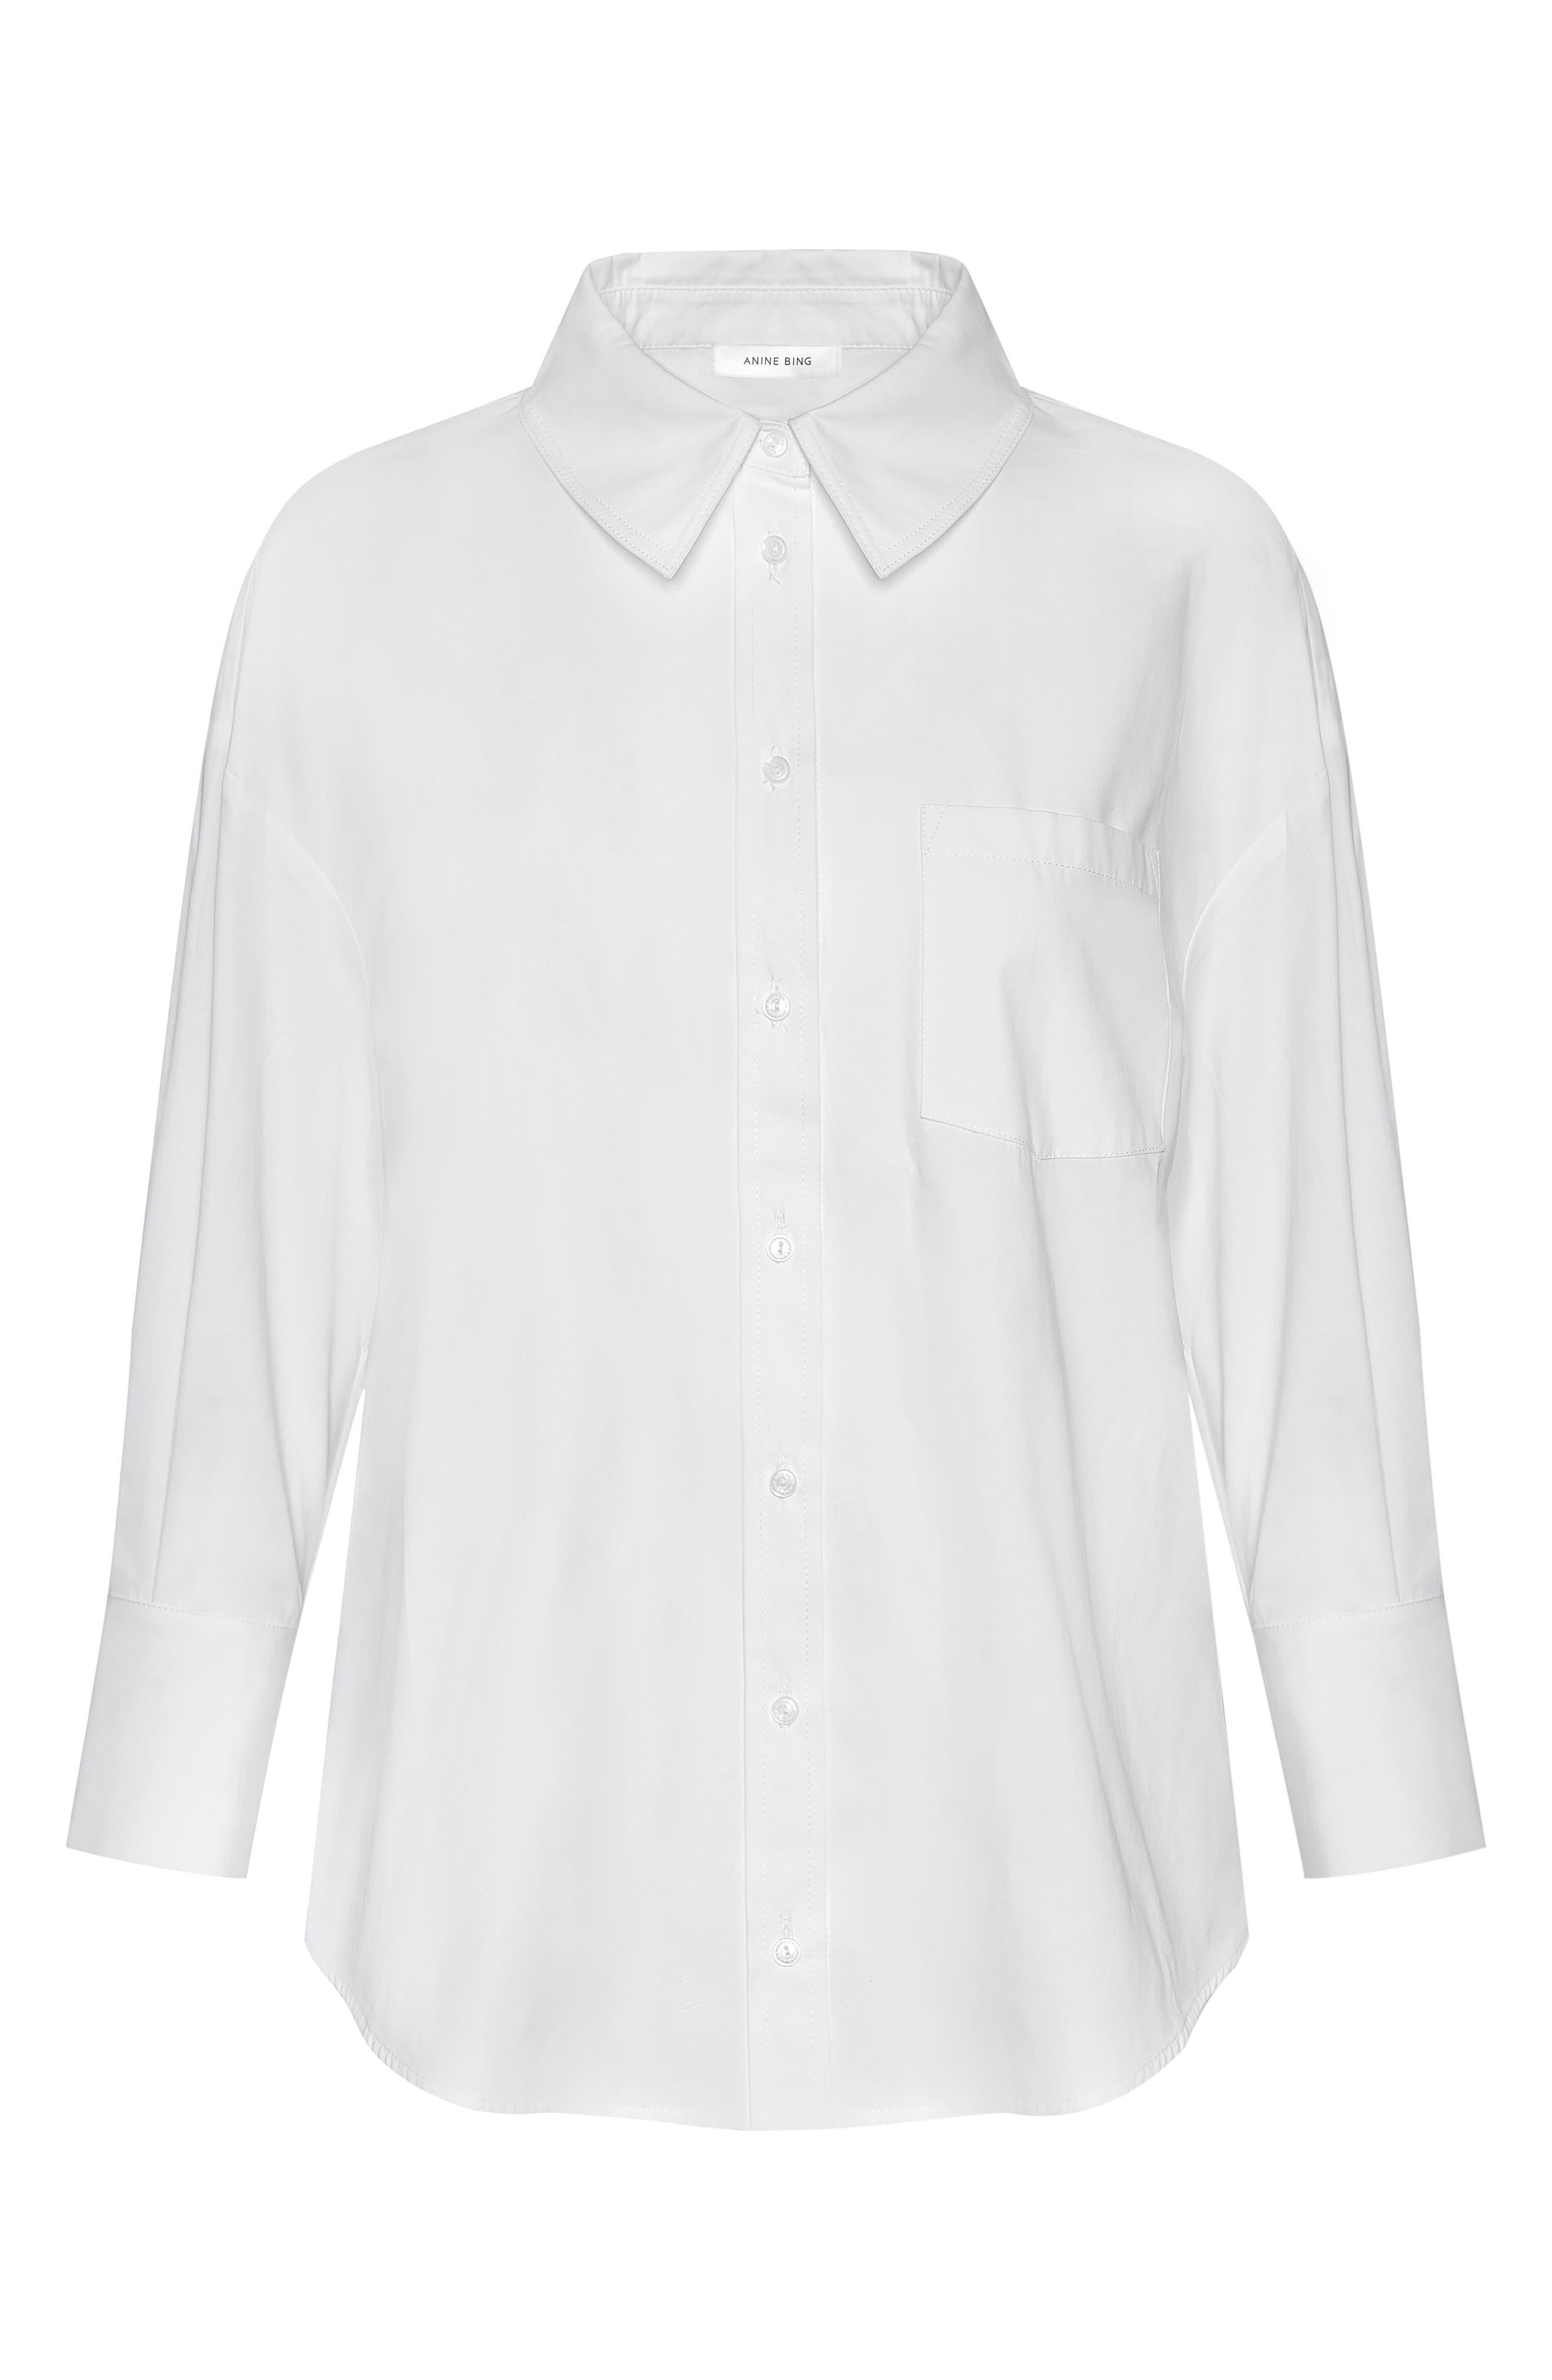 ANINE BING,                             Mika Shirt,                             Alternate thumbnail 5, color,                             100